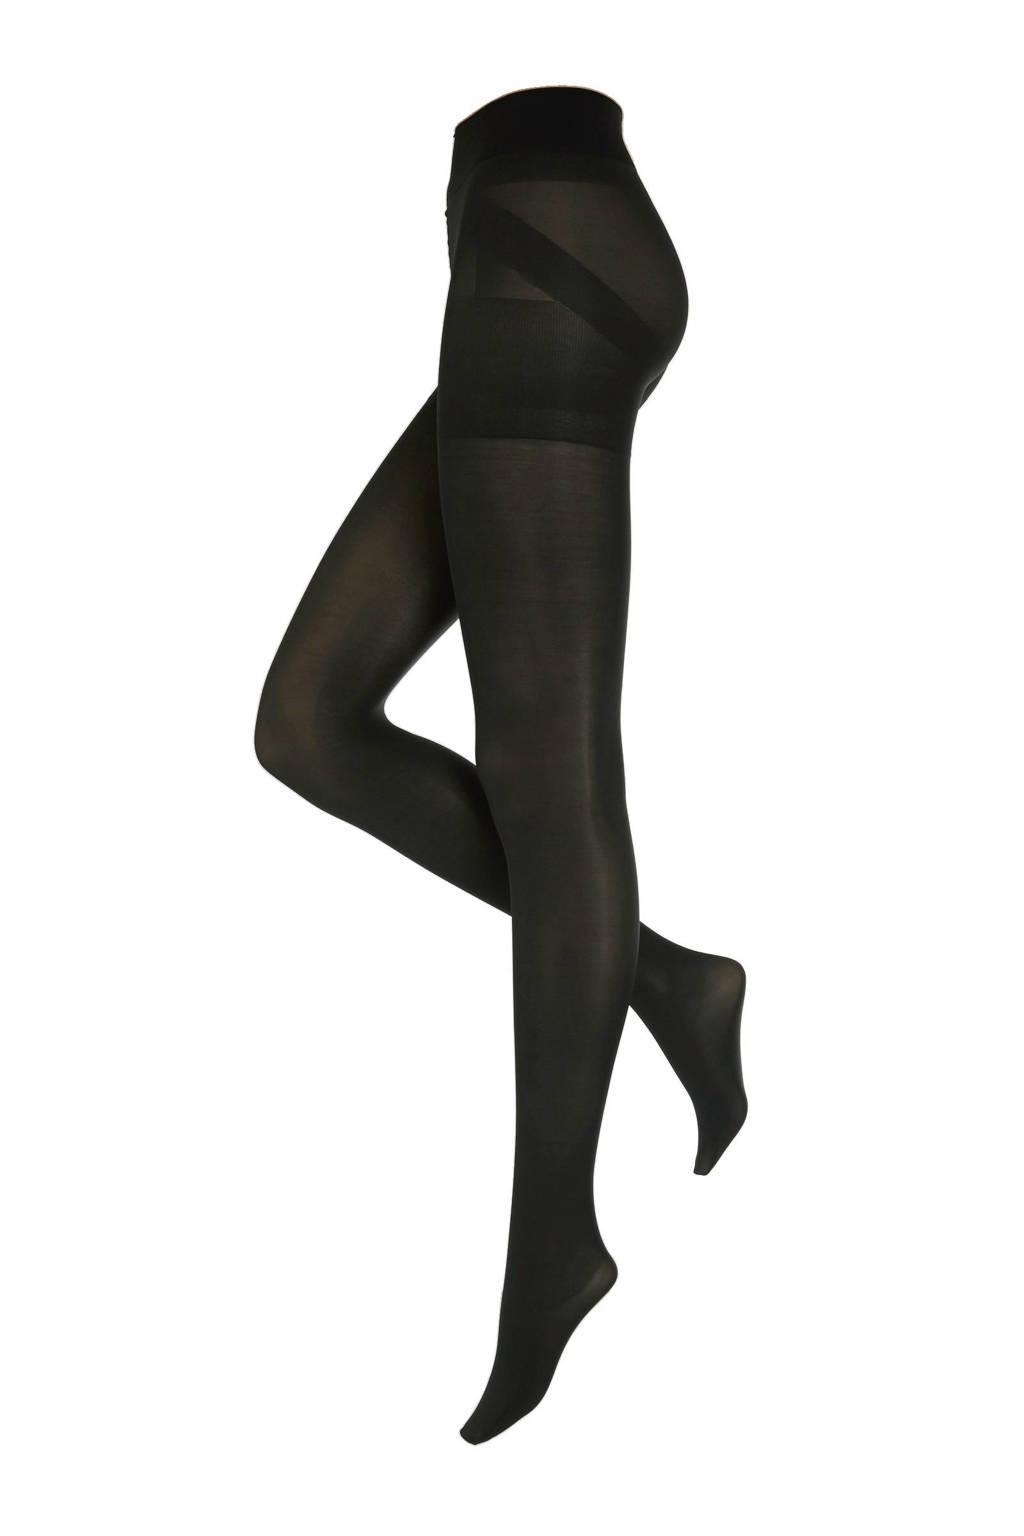 Oroblu panty Shock Up 60 den zwart, Zwart